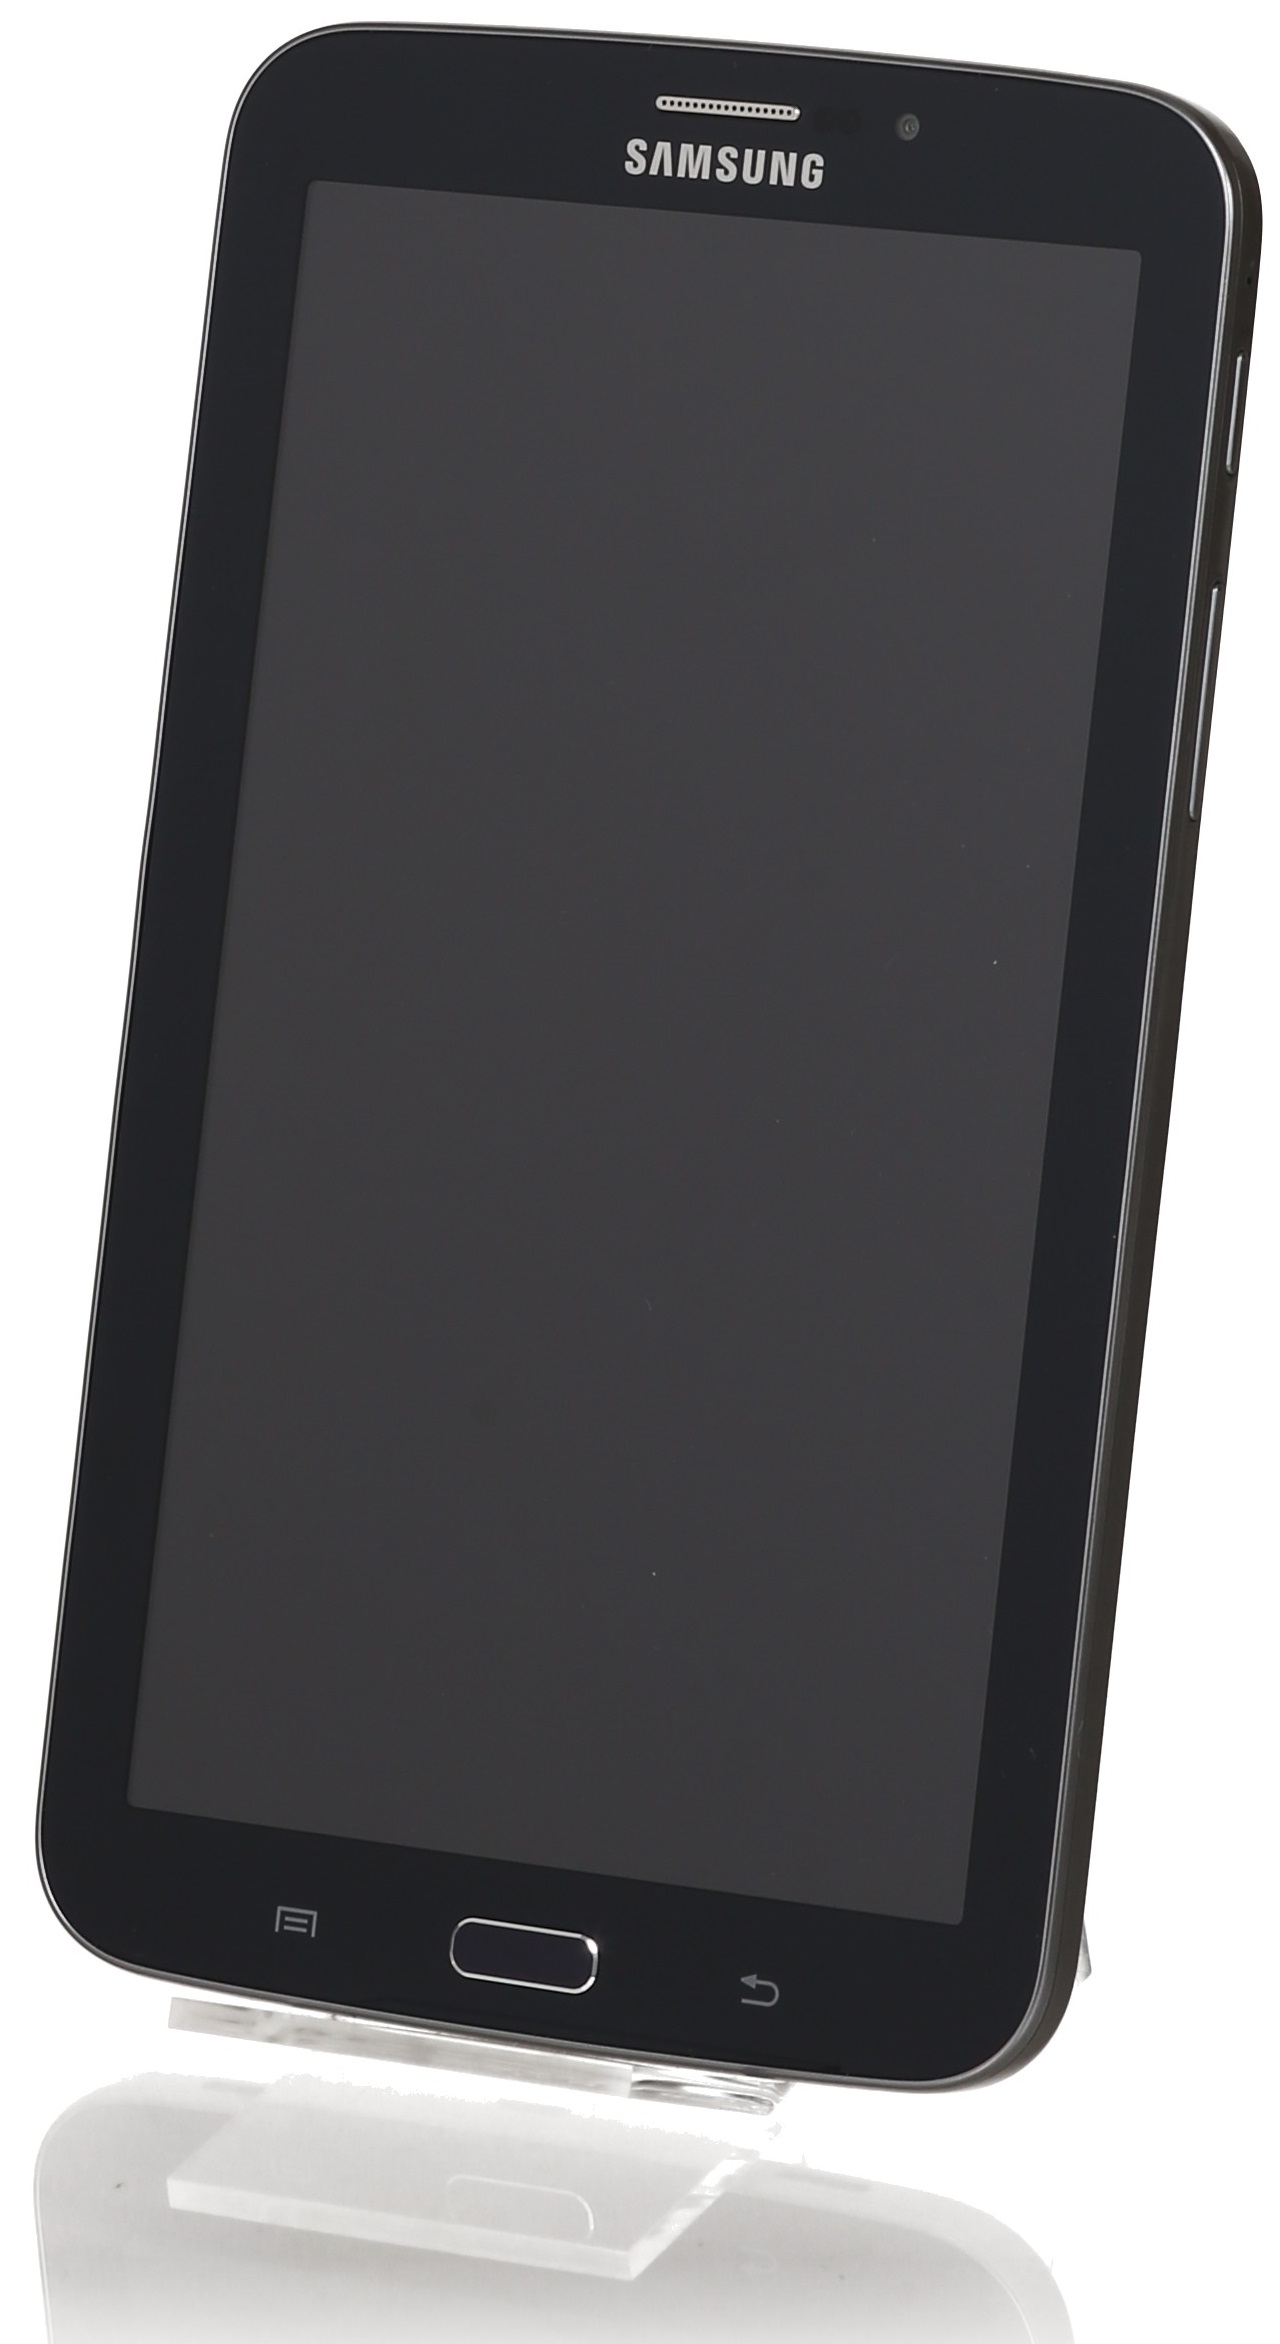 Samsung Galaxy Tab 3 7.0 7 8GB [Wi-Fi] zwart